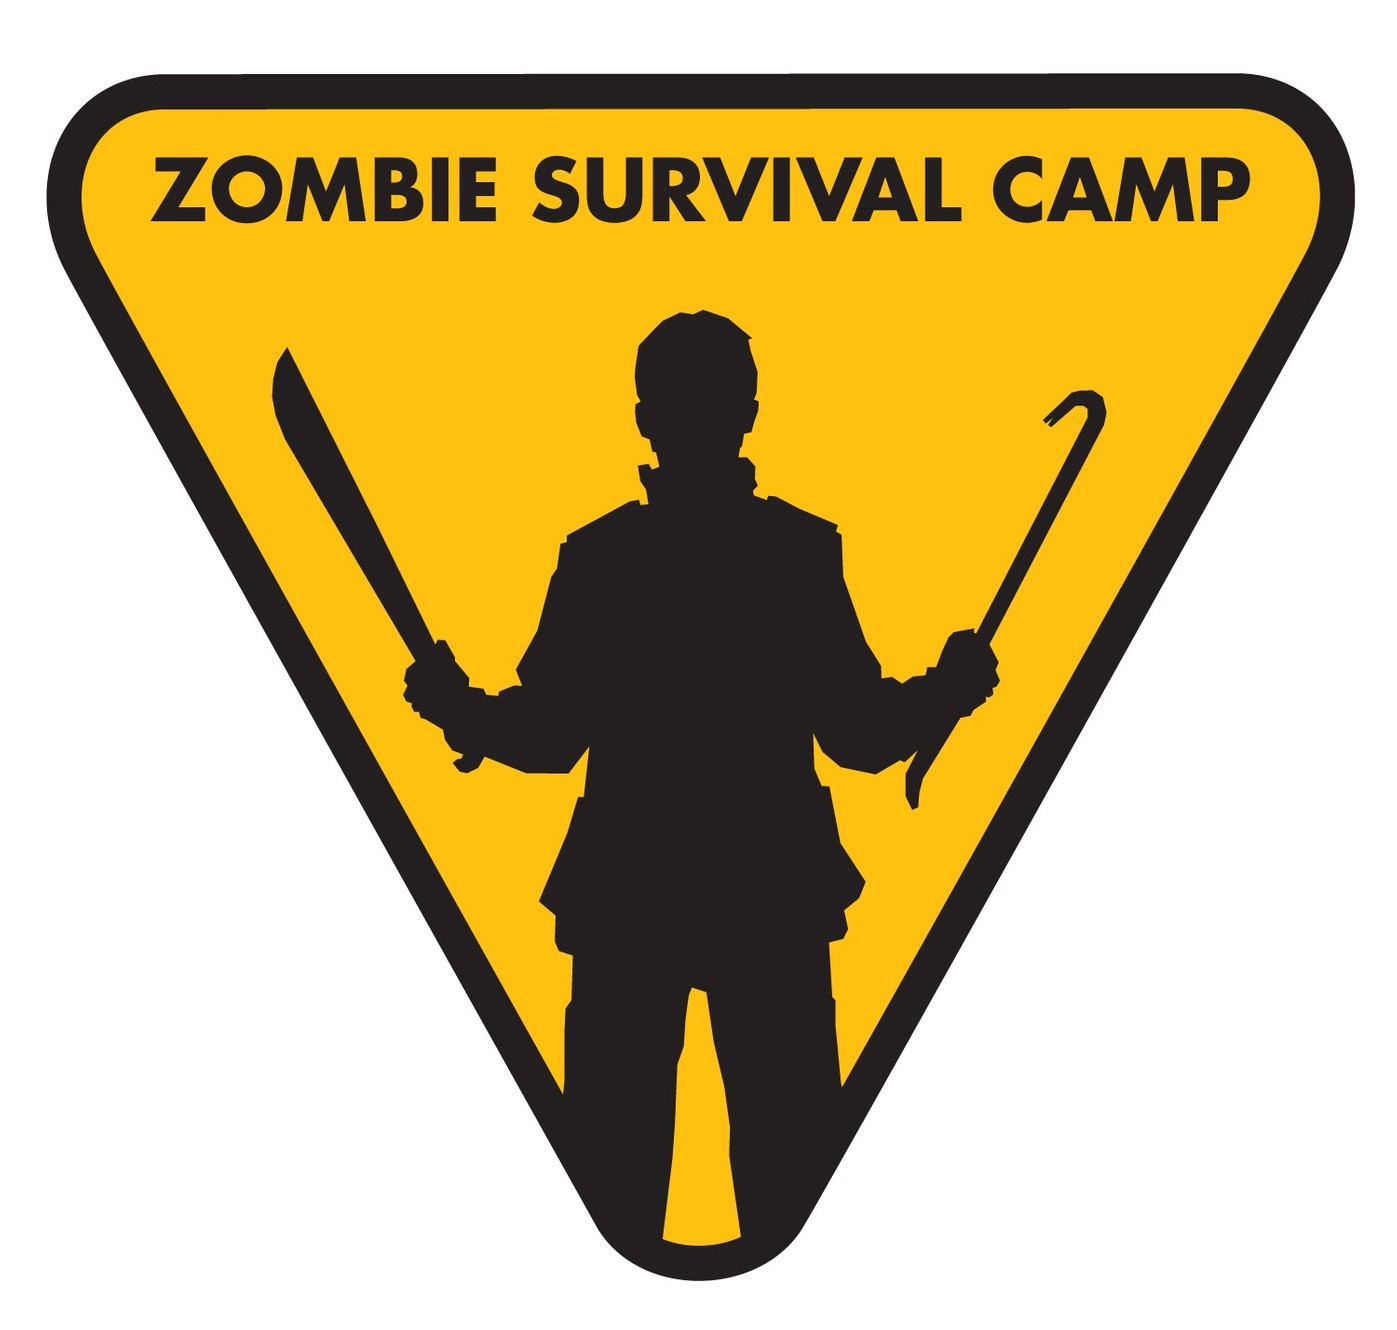 Adult Camp   Zombie Survival Camp verwandt mit Zombie Apocalypse Survival Training